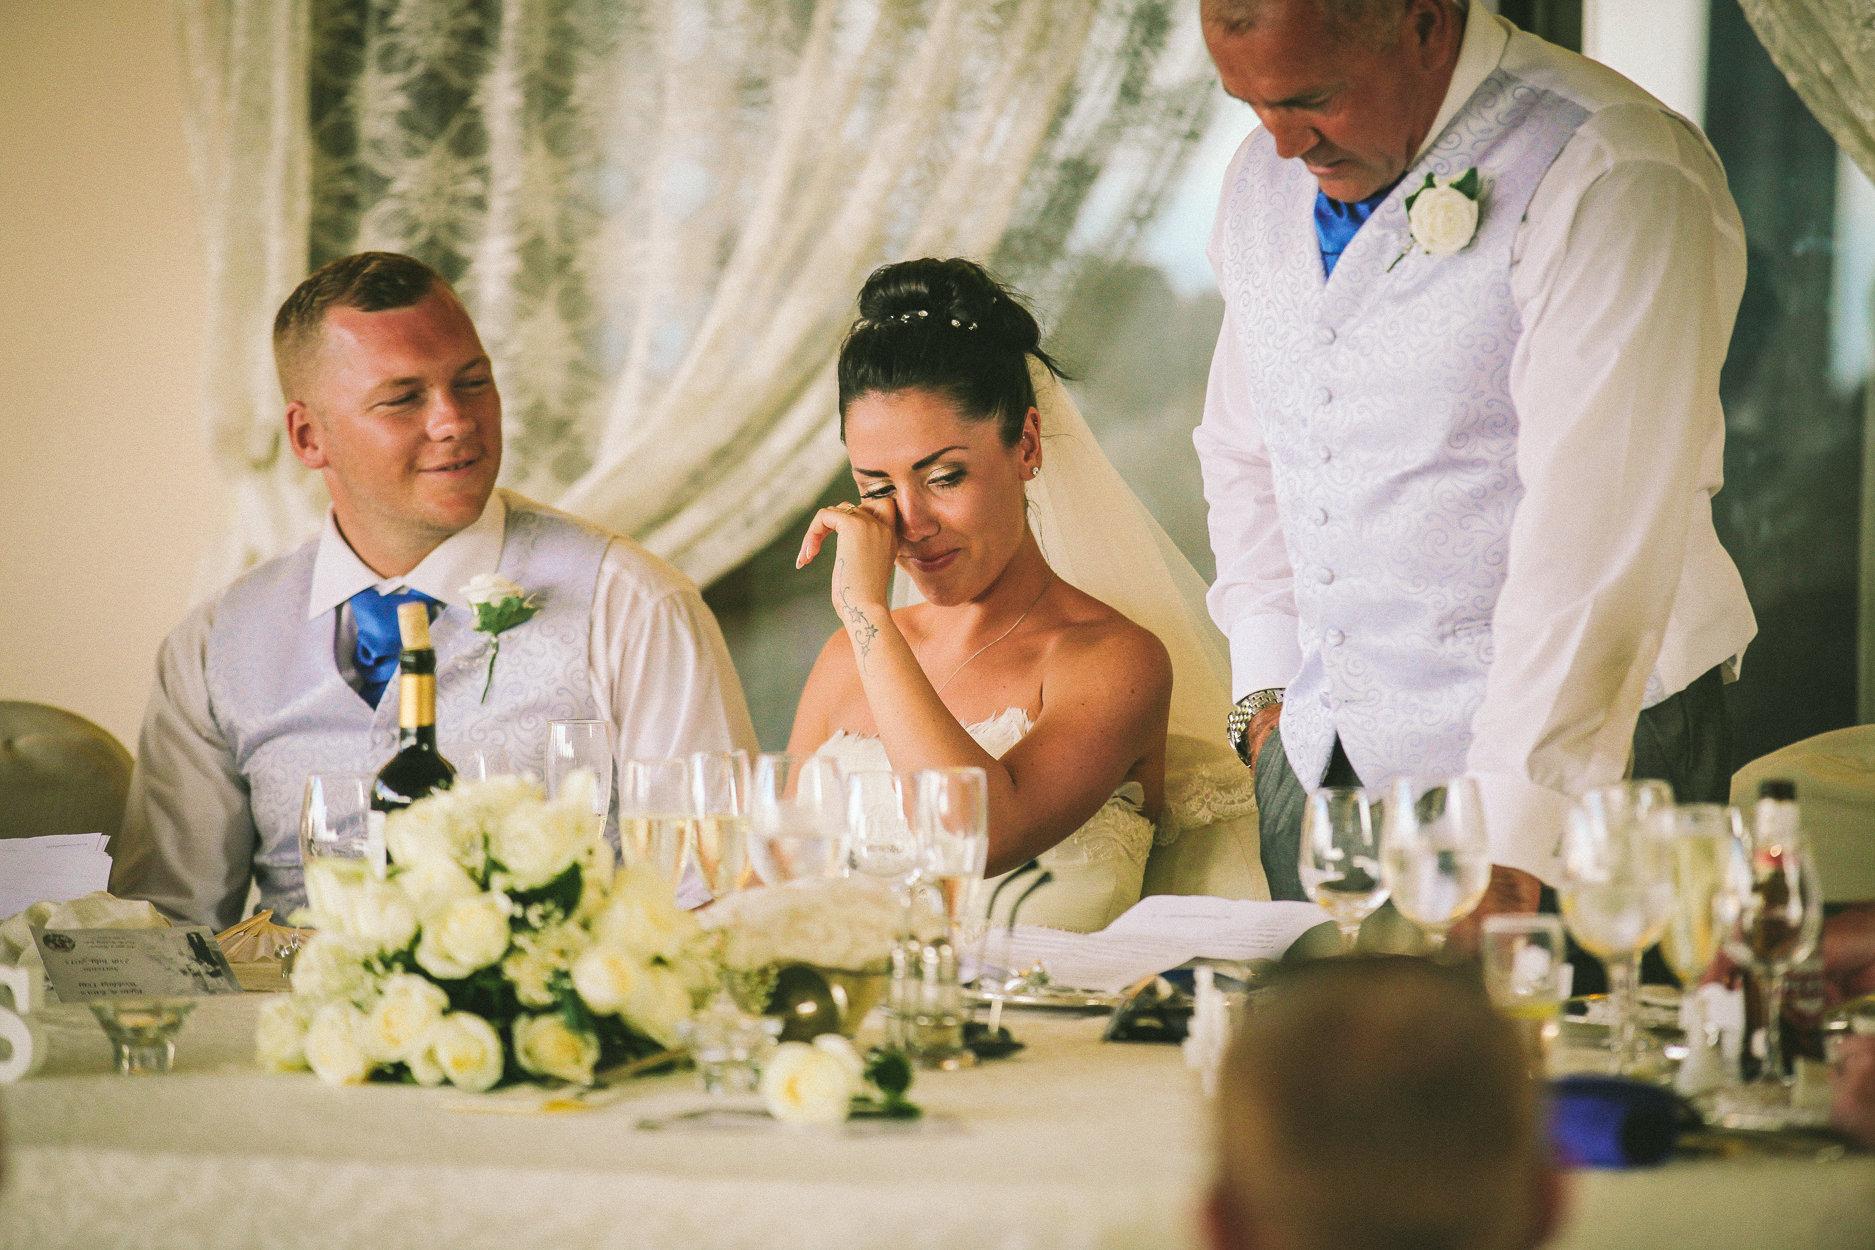 Amalfi-Coast-wedding-venue-Wedding-Photography-Villa Antiche Mura-Sorrento-Italy-6